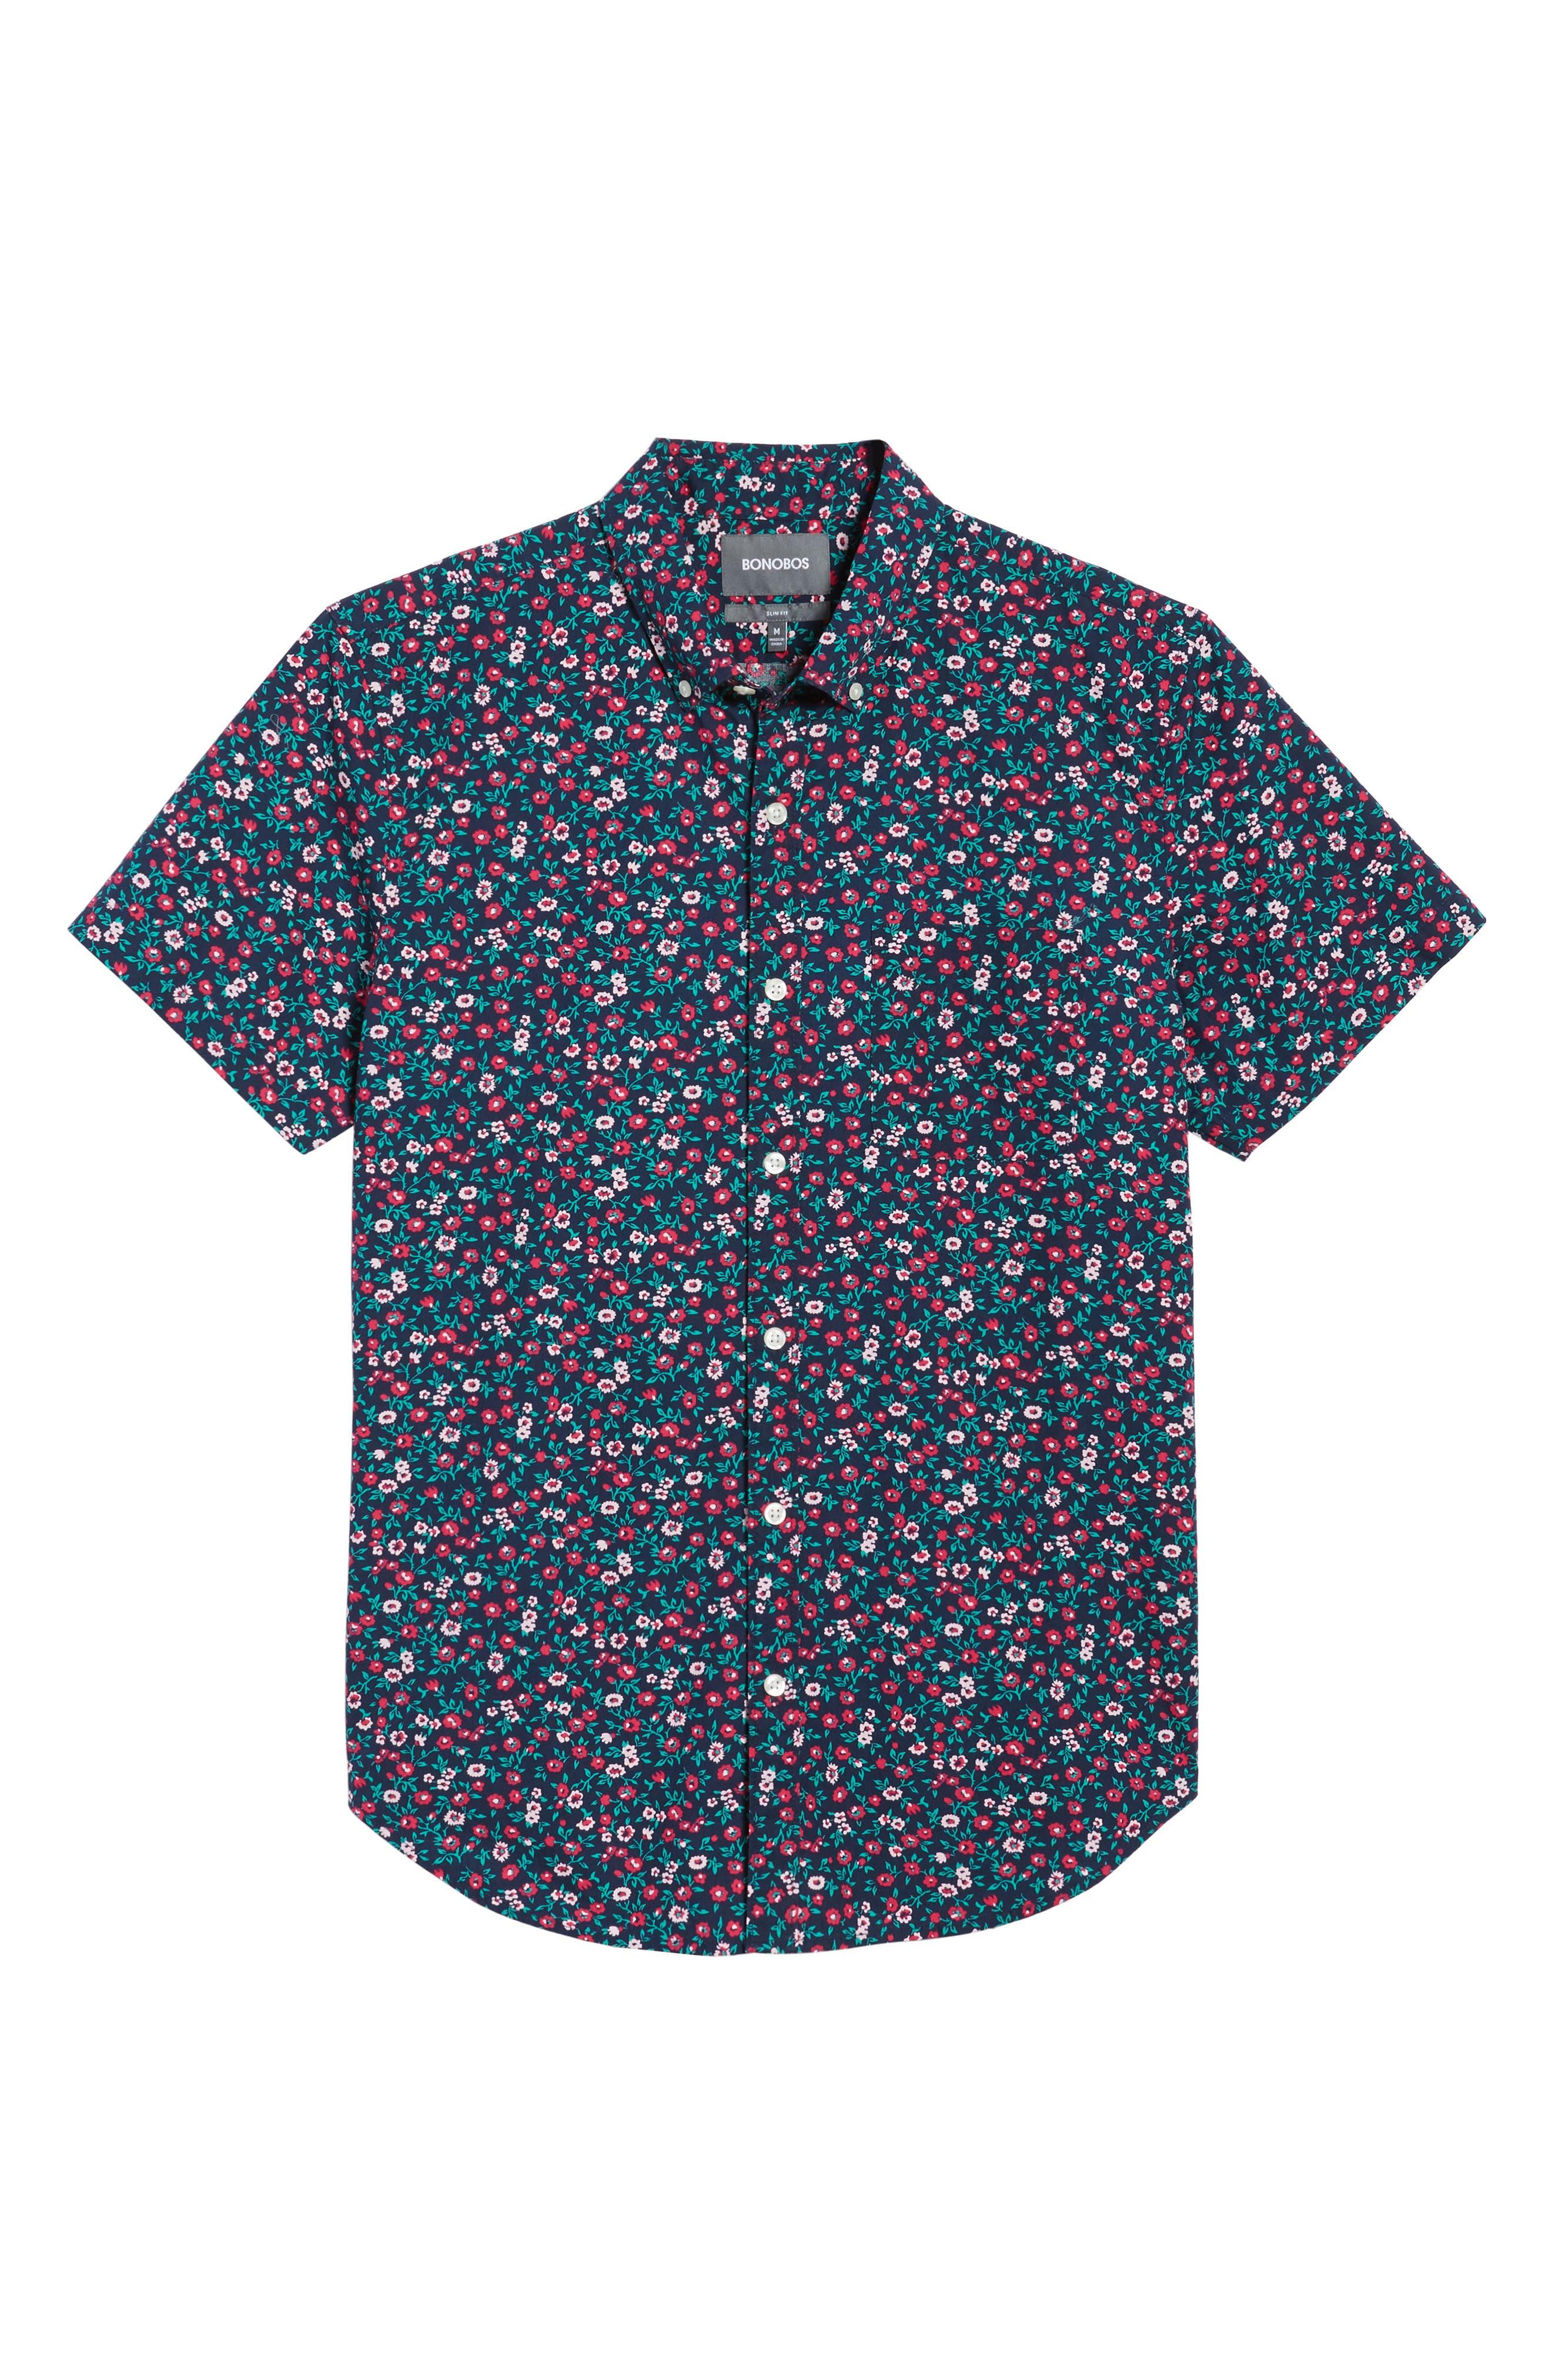 Slim Fit Print Short Sleeve Sport Shirt,                             Alternate thumbnail 6, color,                             Whitecap Floral - Red